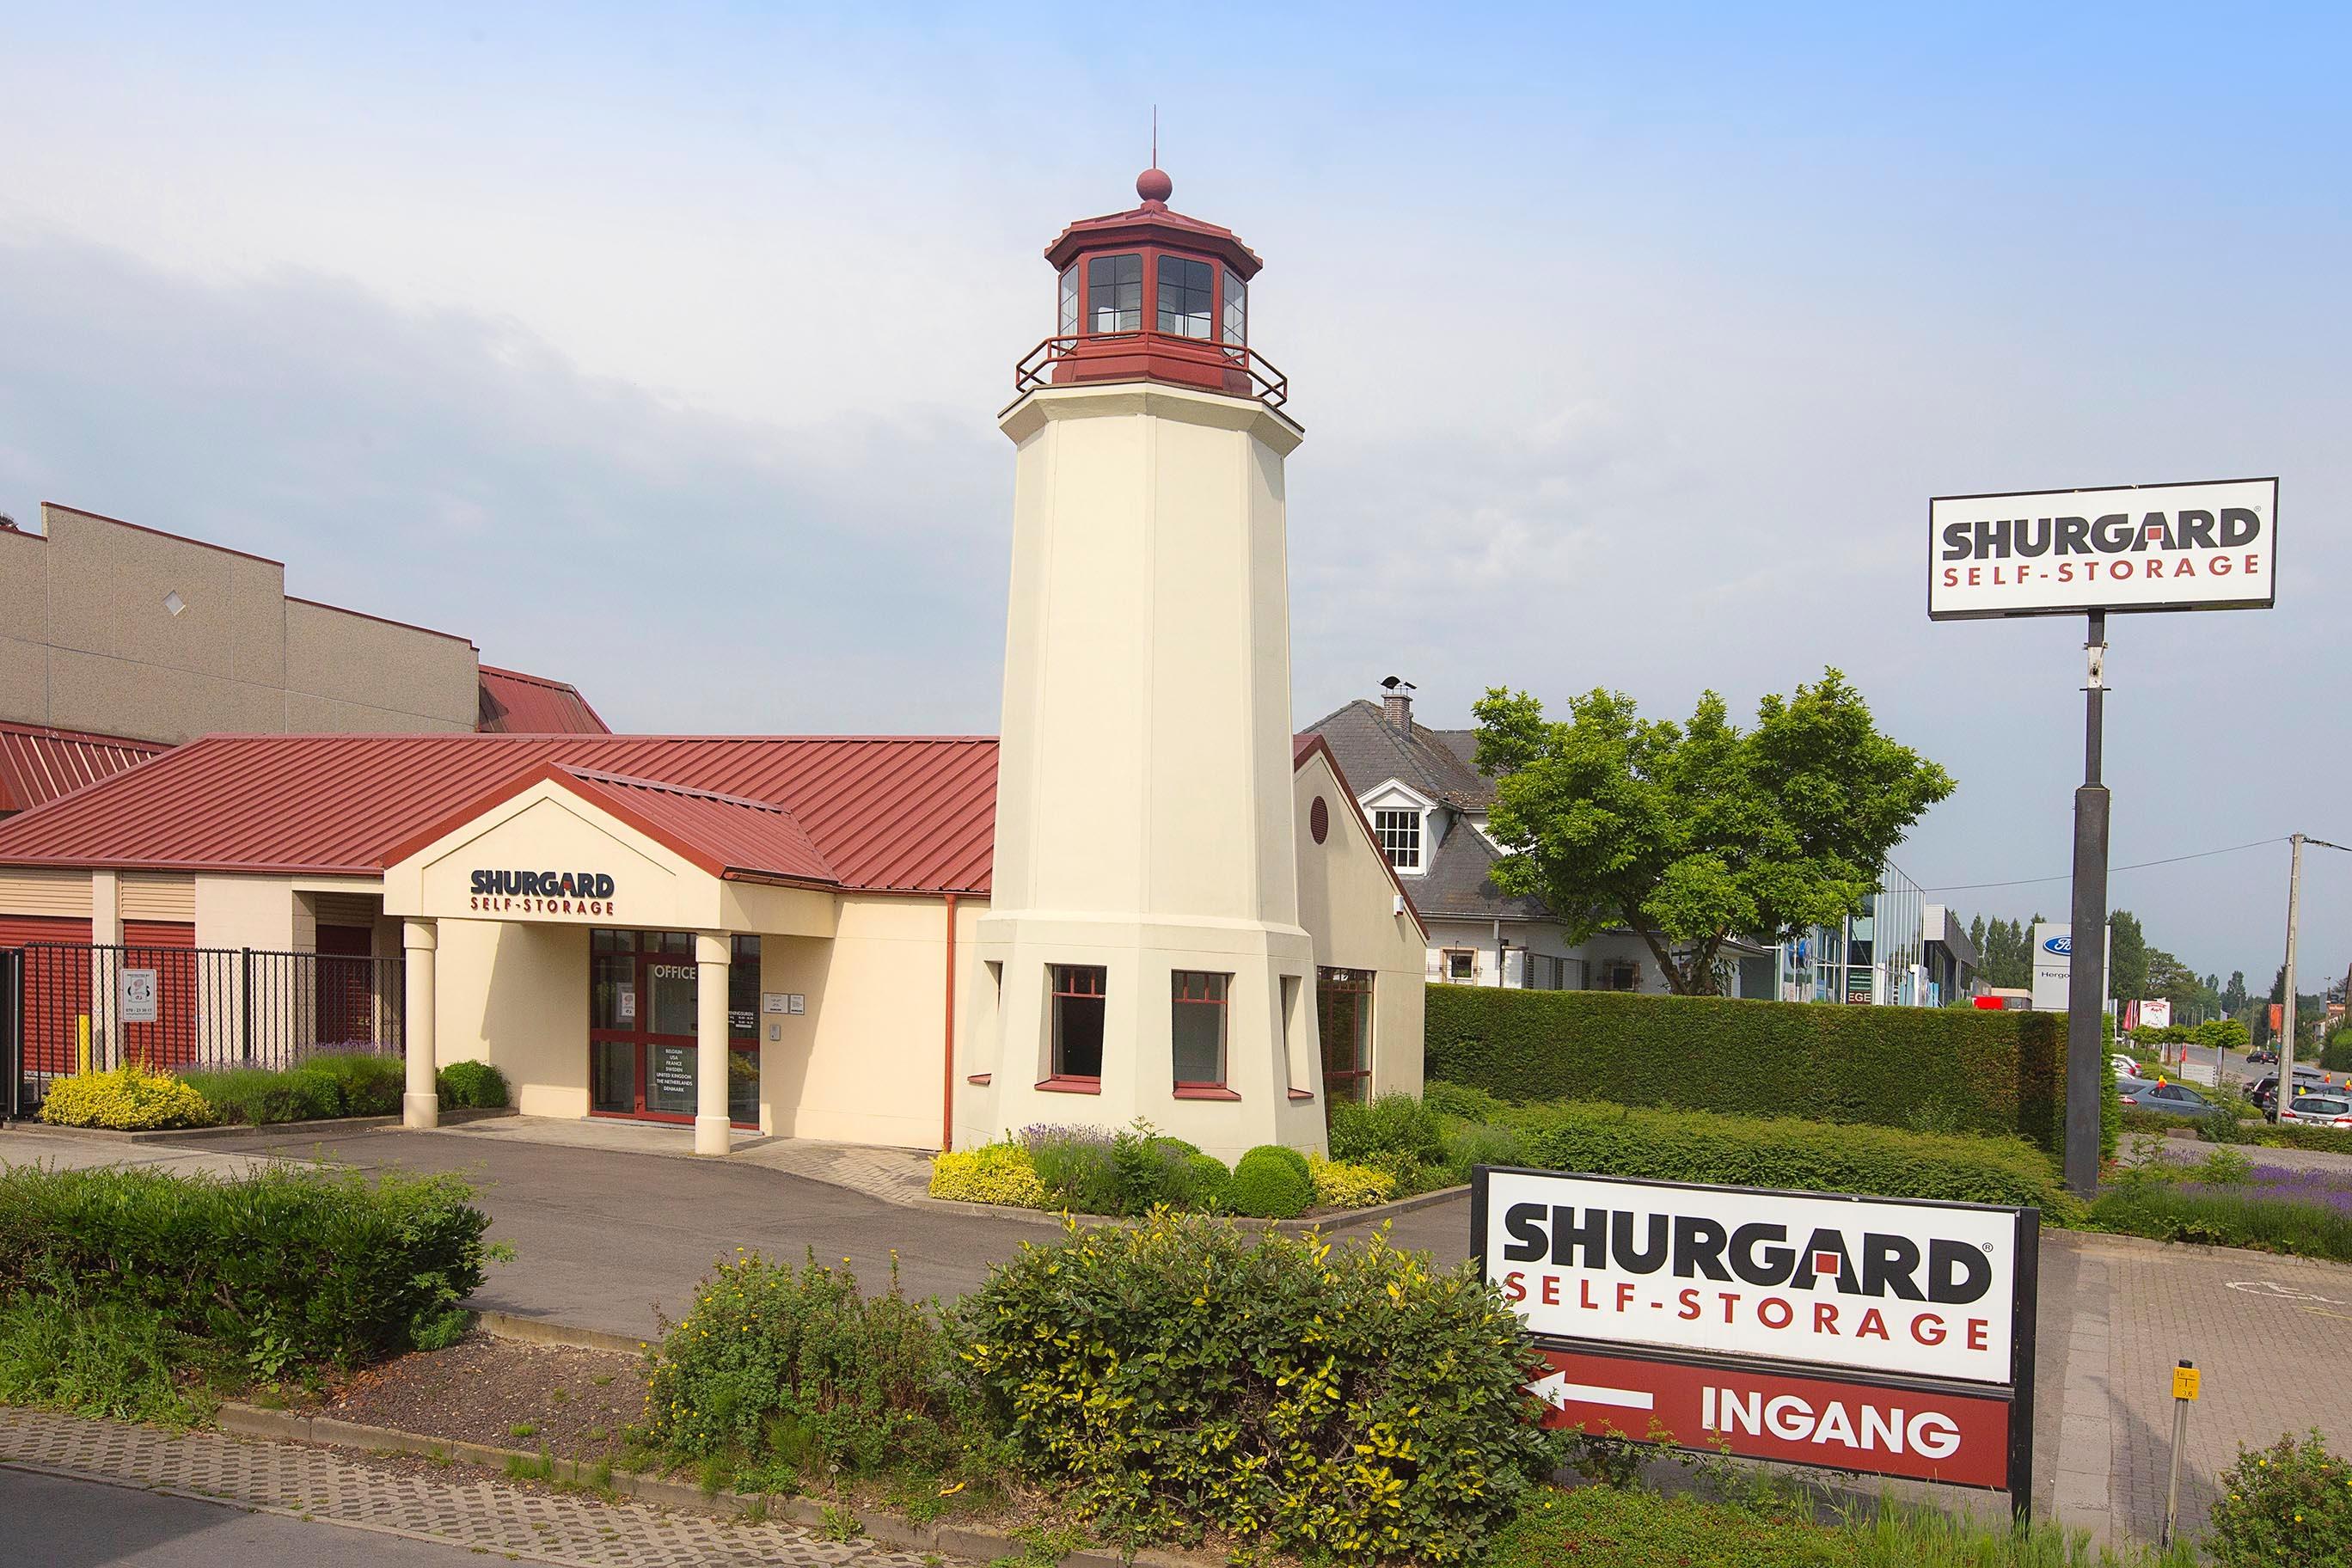 Shurgard Self-Storage Overijse